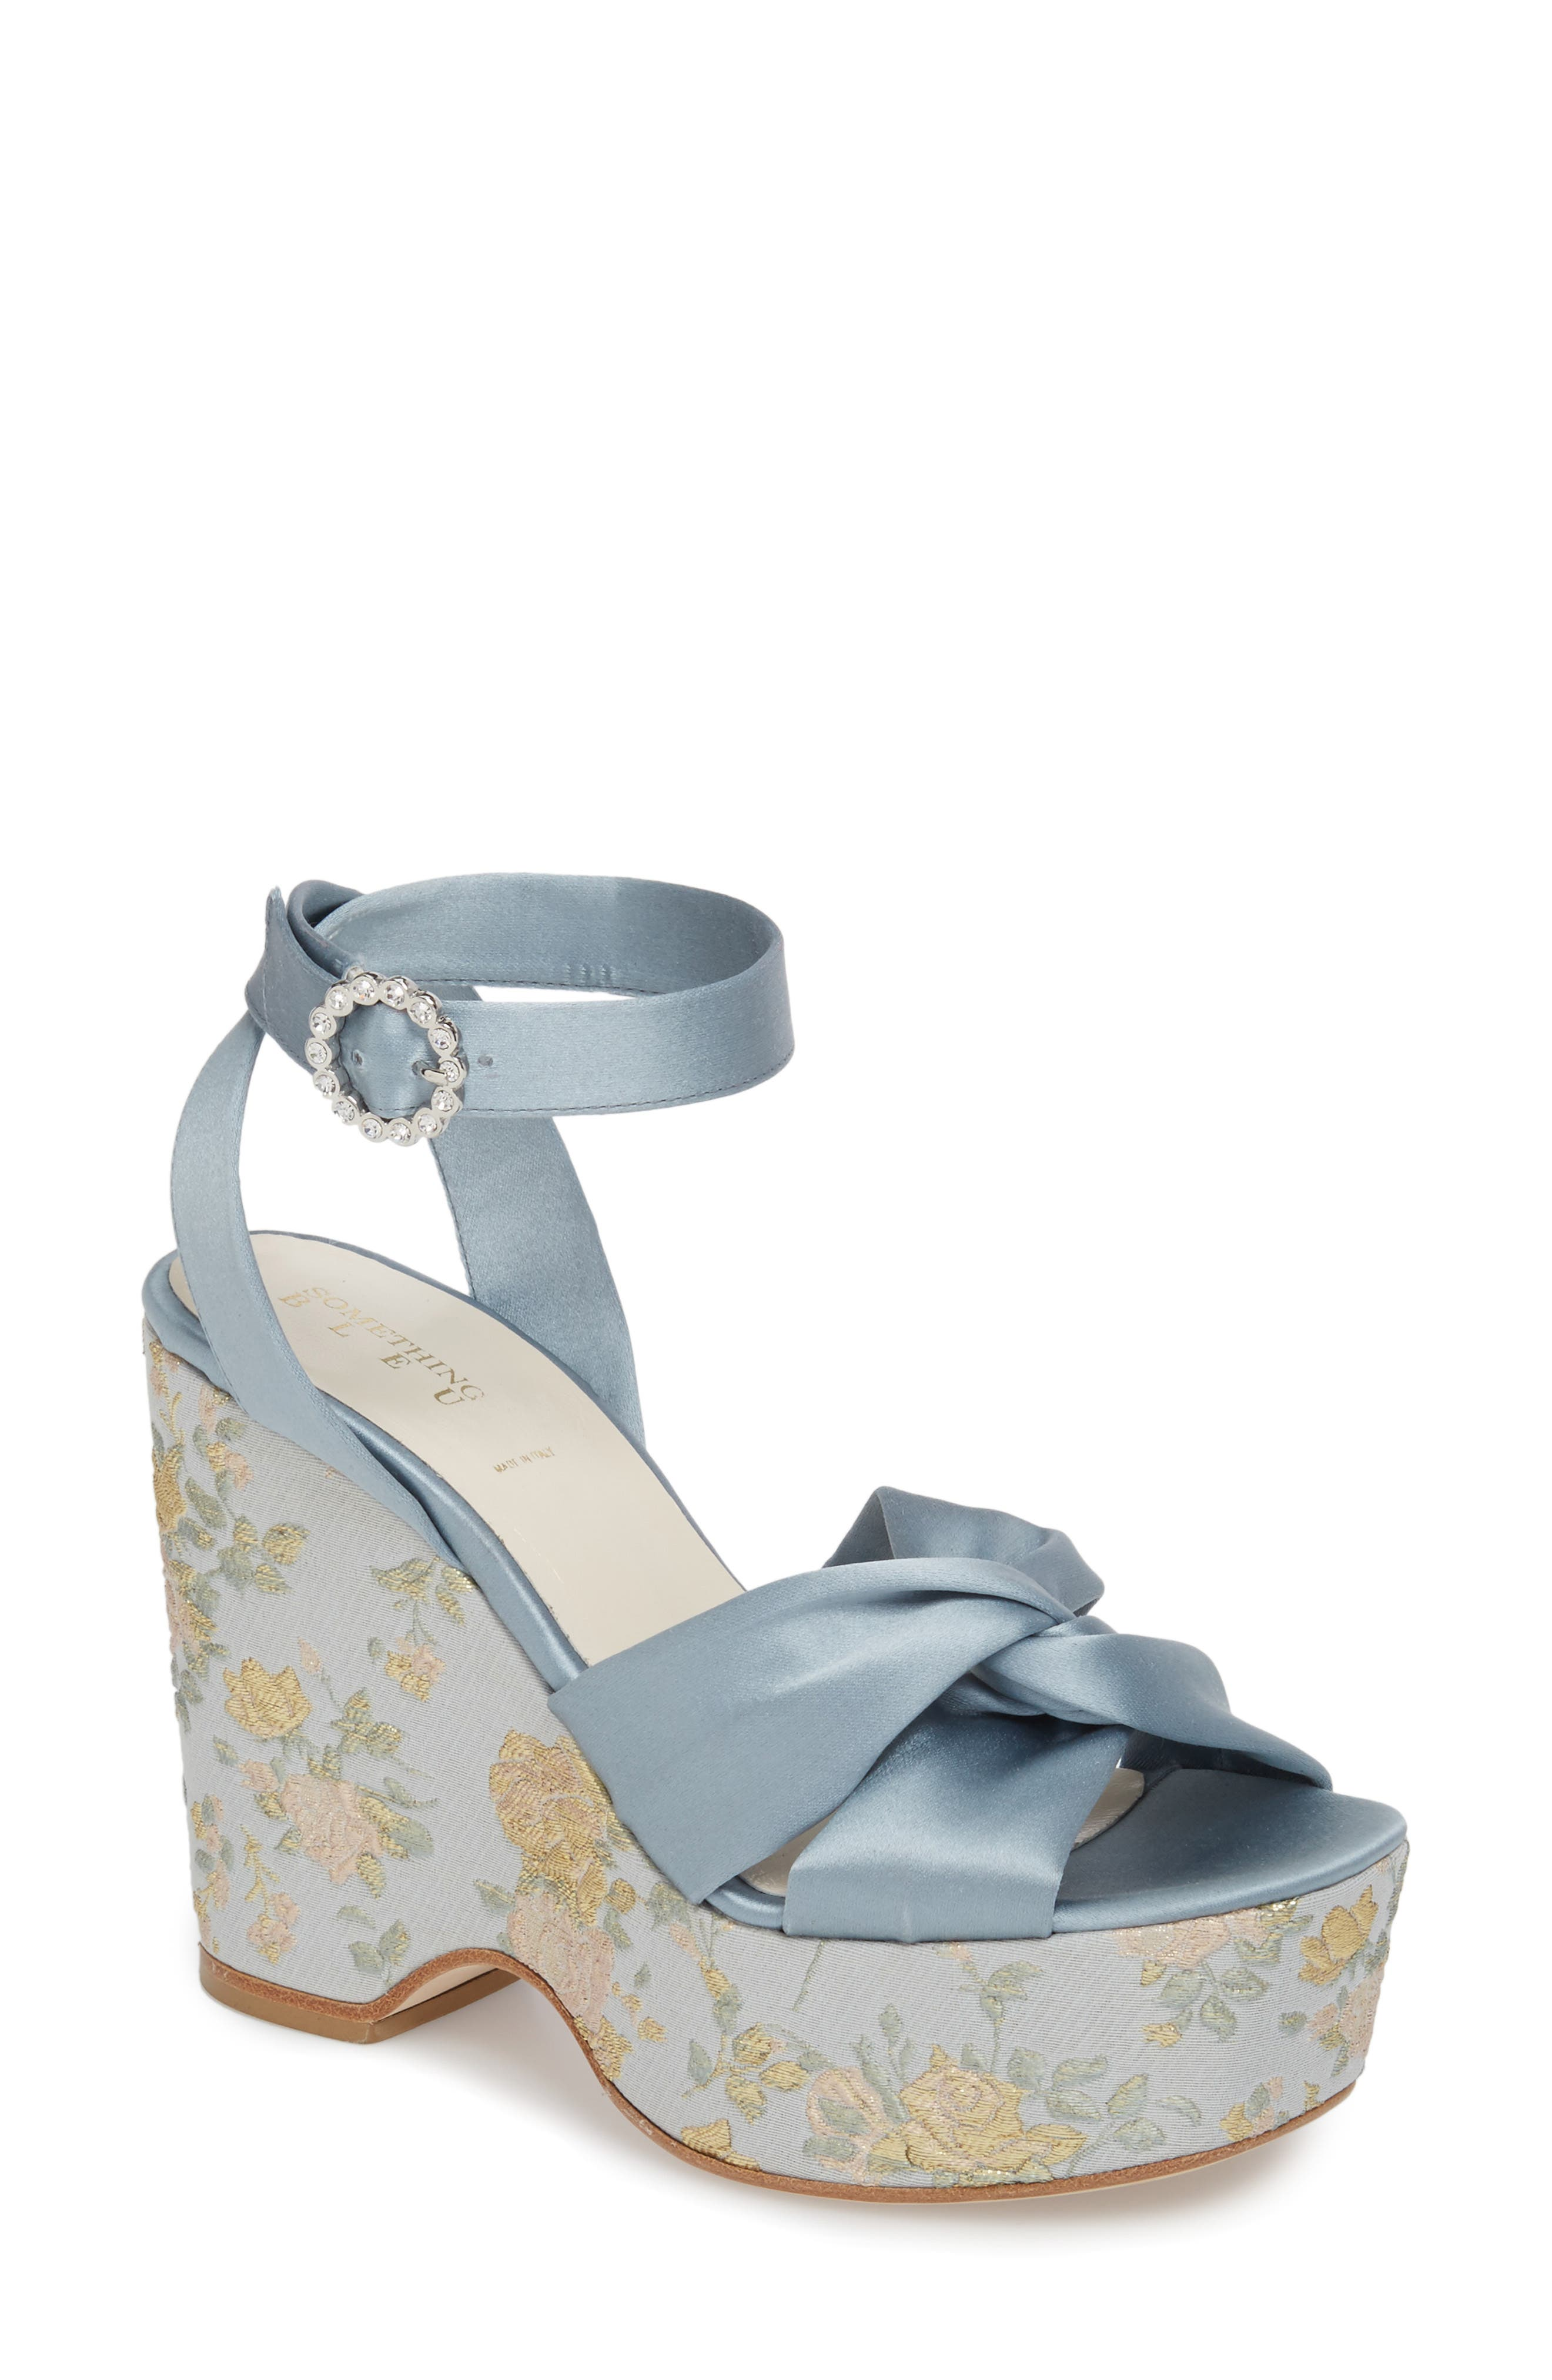 Serena Brocade Platform Sandal,                         Main,                         color, Pearl Blue Satin